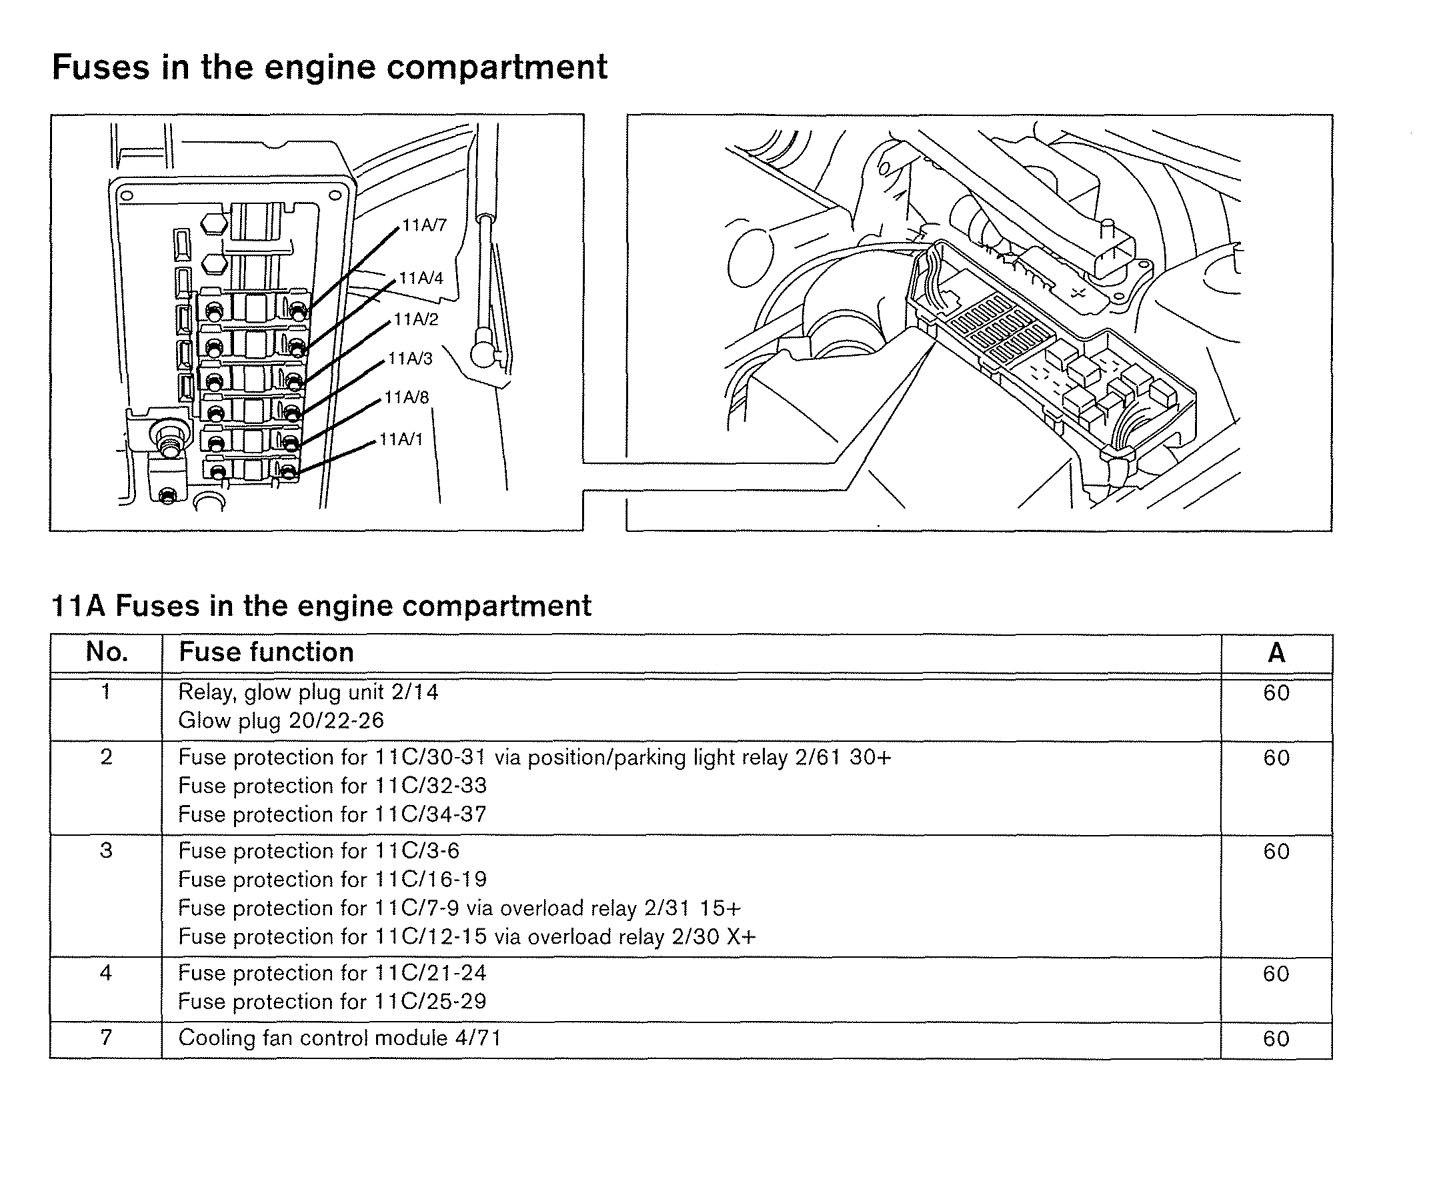 Volvo V40 Towbar Wiring Diagram -2003 Hyundai Accent Wiring Diagram |  Begeboy Wiring Diagram Source | Volvo Towbar Wiring Diagram |  | Bege Wiring Diagram - Begeboy Wiring Diagram Source